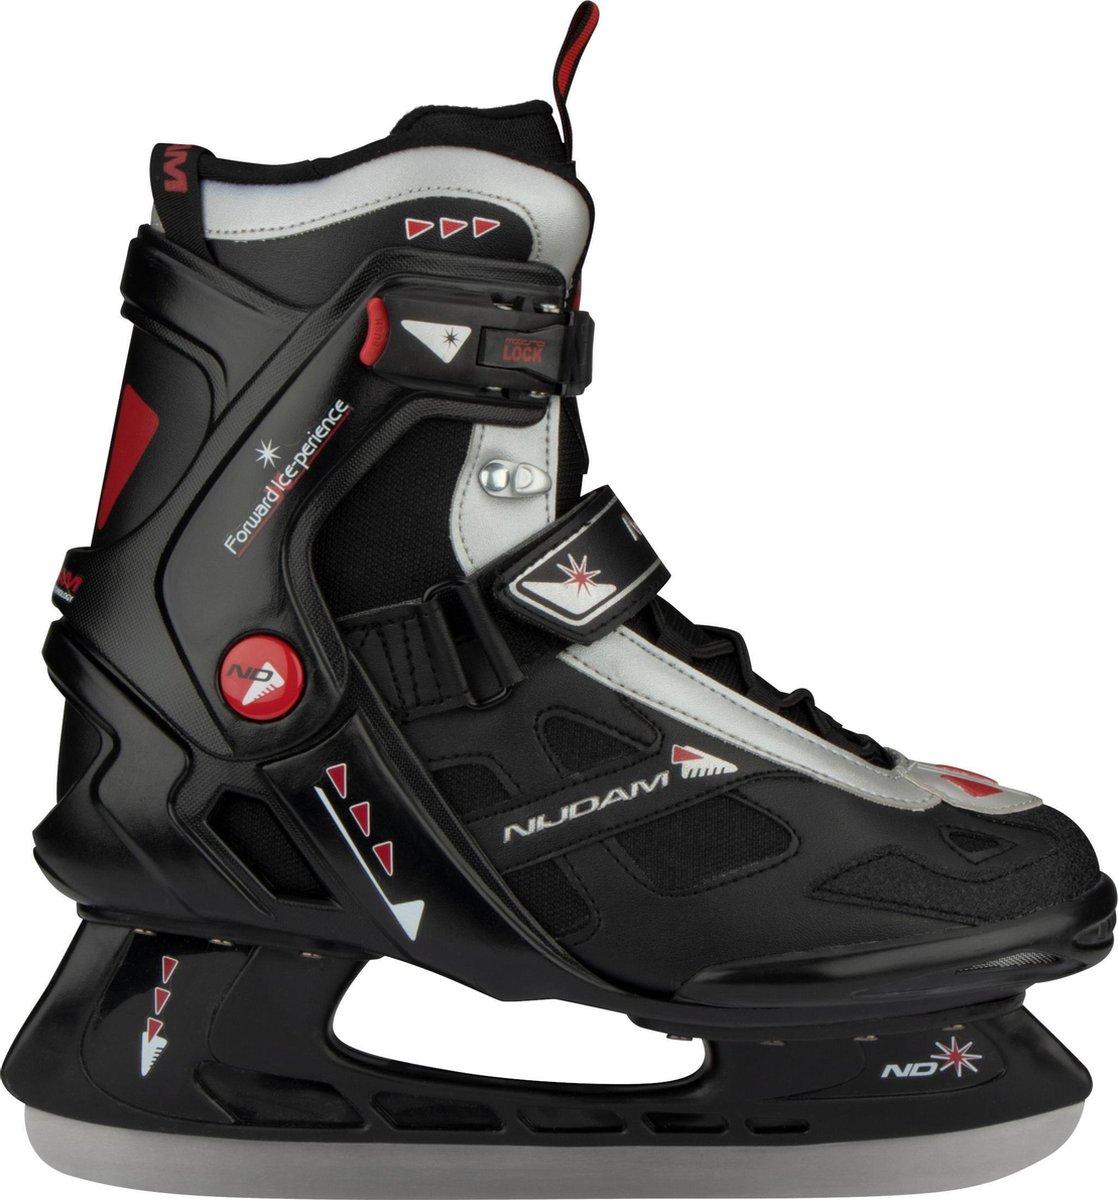 Nijdam IJshockeyschaats - Semi-Softboot - Zwart/Zilver/Rood - 39